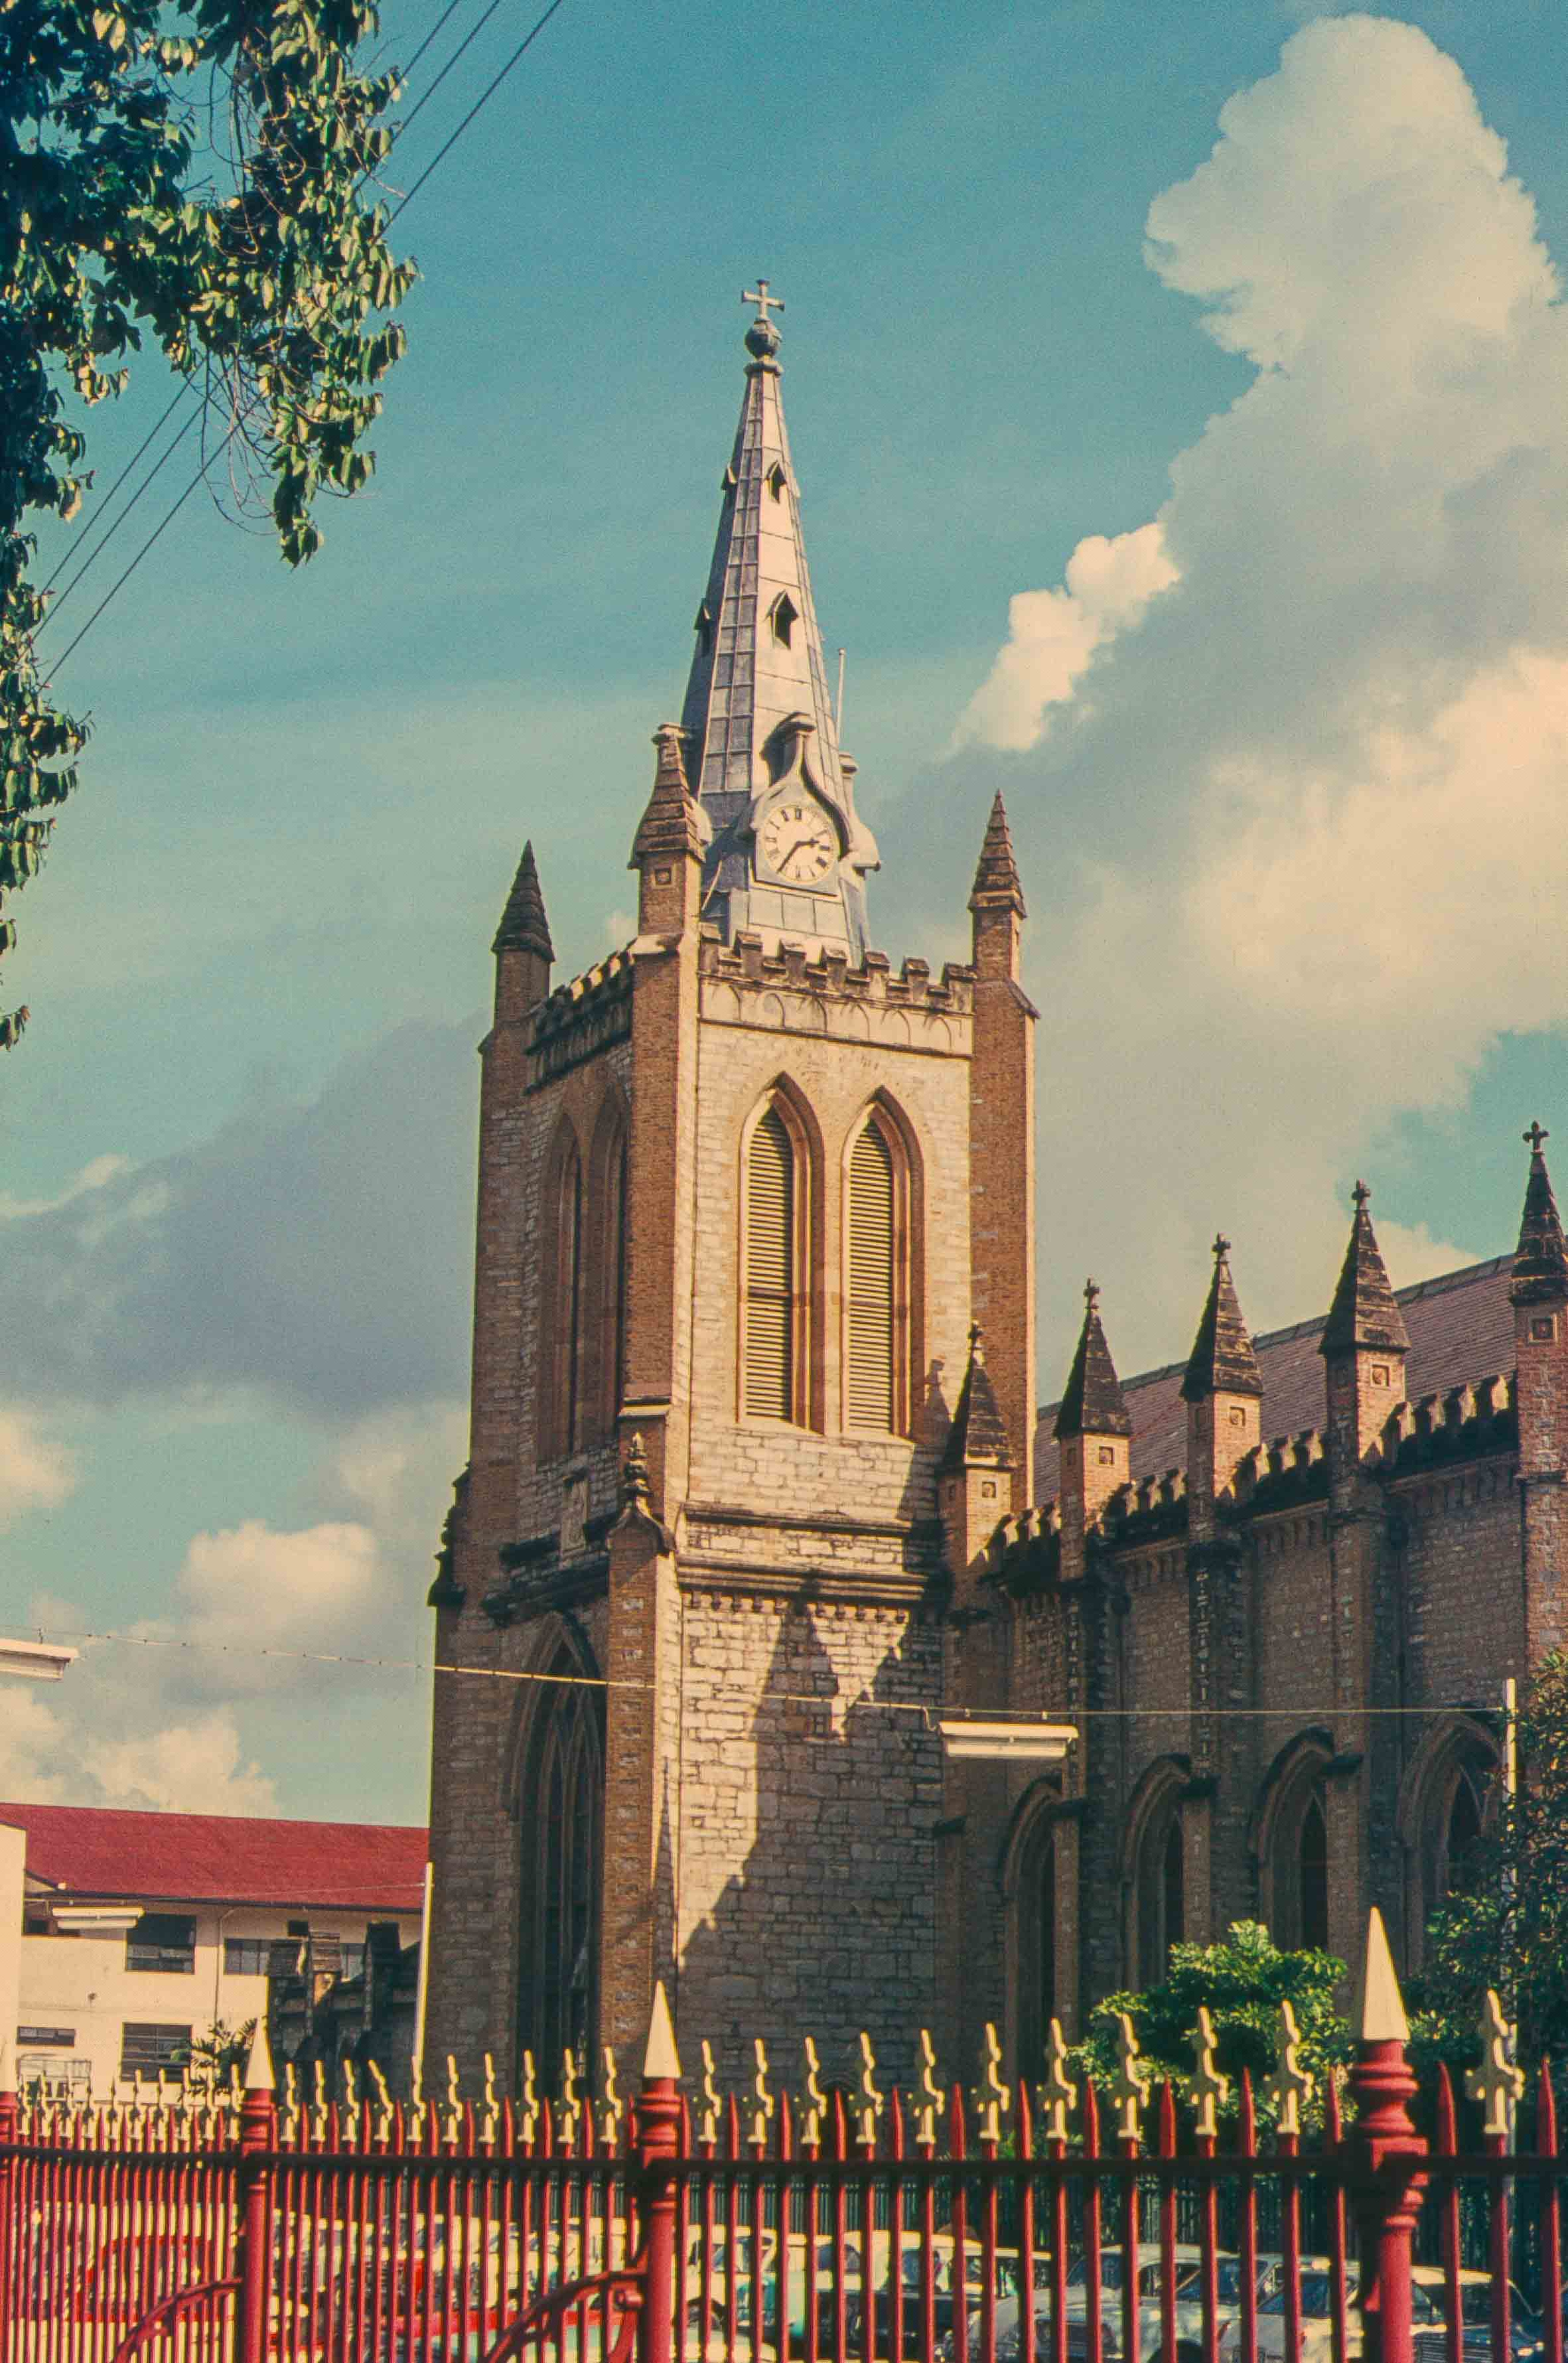 597. Suriname